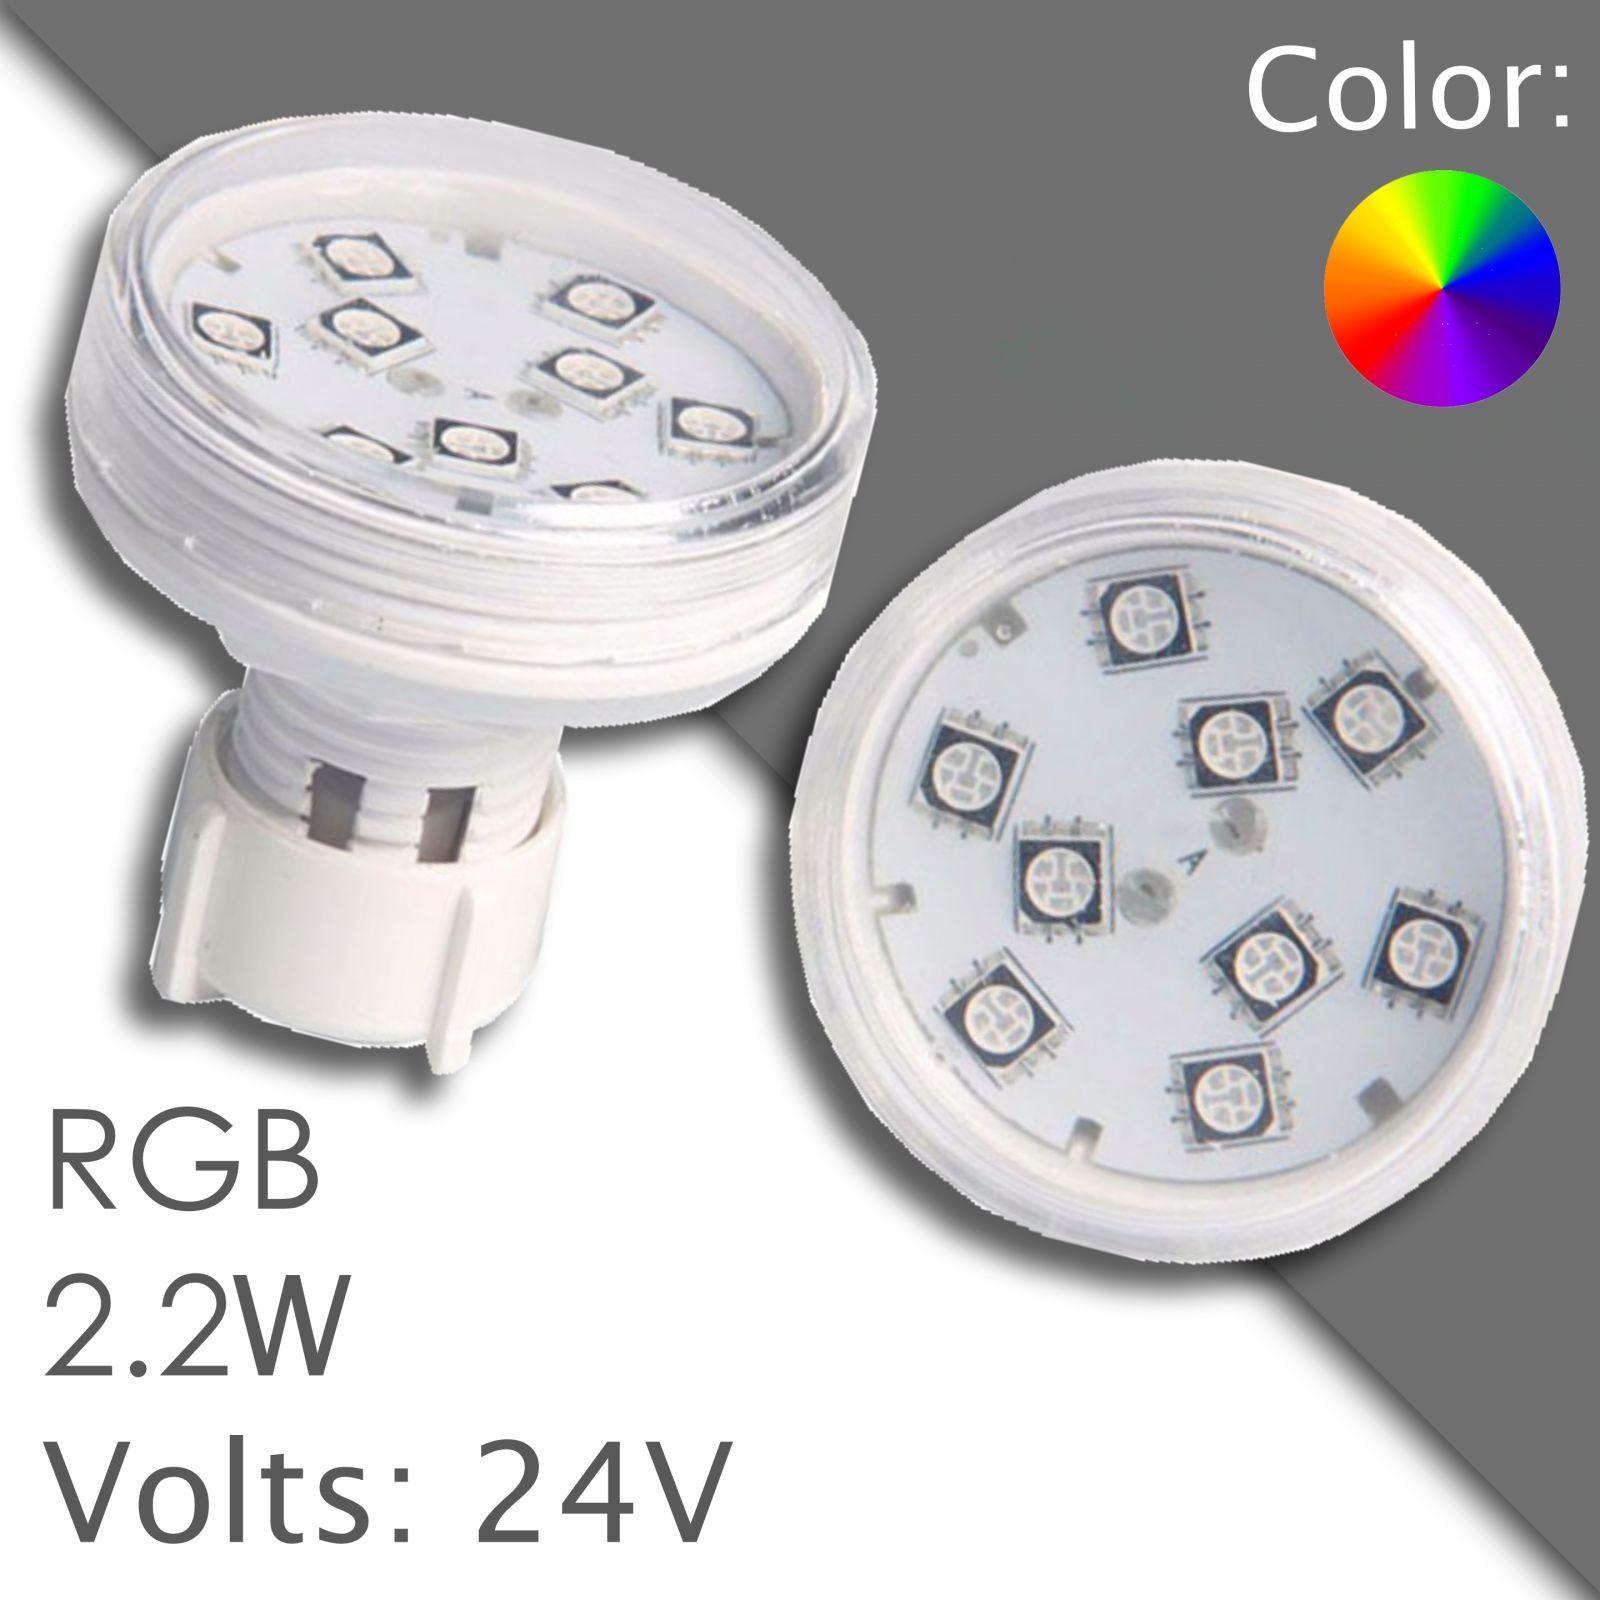 Led RGB 45/60mm automatic, waterproof